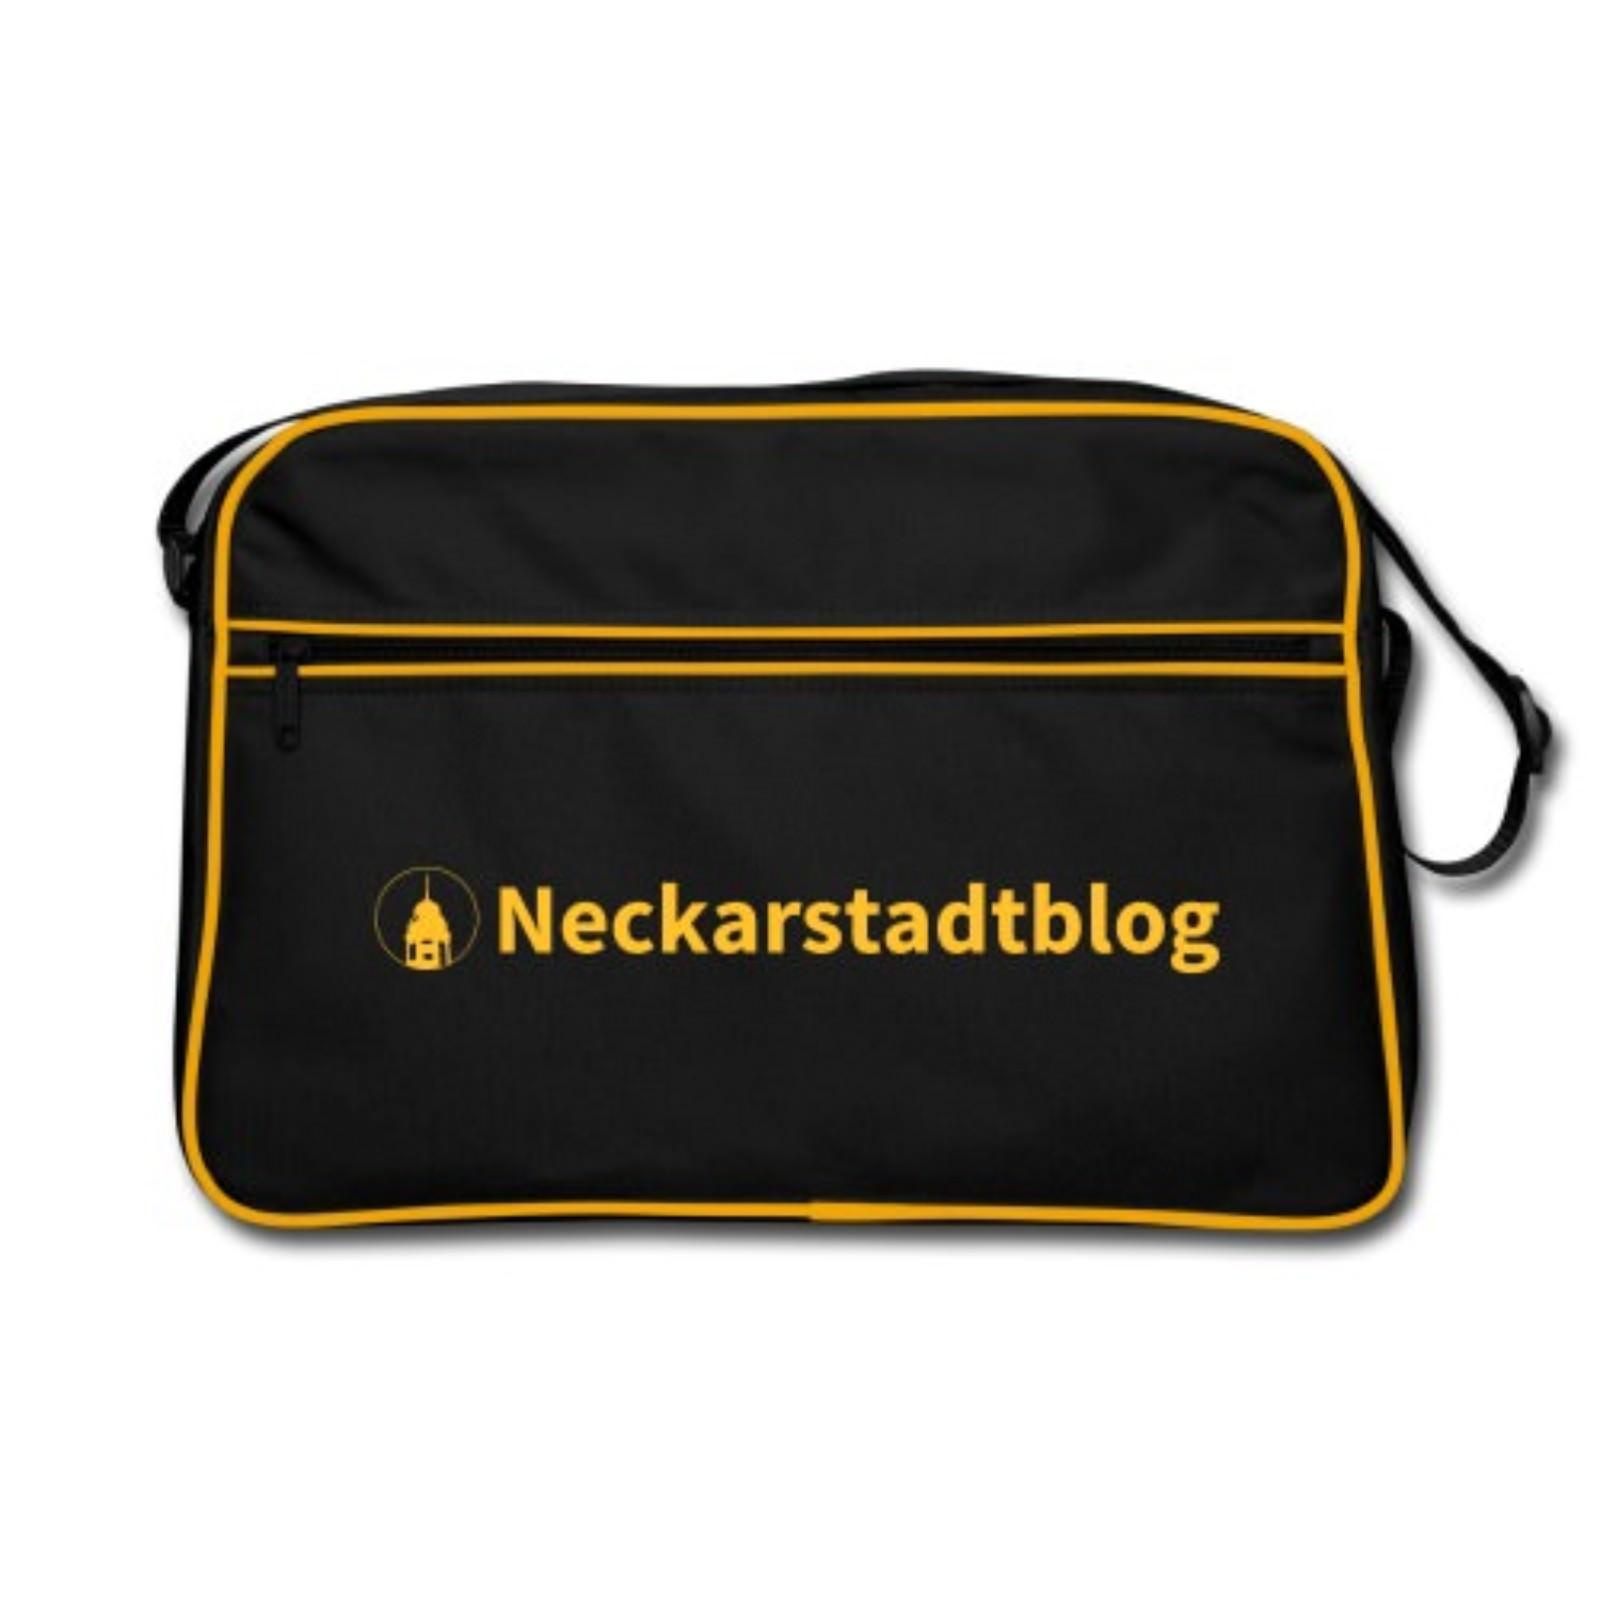 neckarstadtblog-logo-schmal-retro-tasche